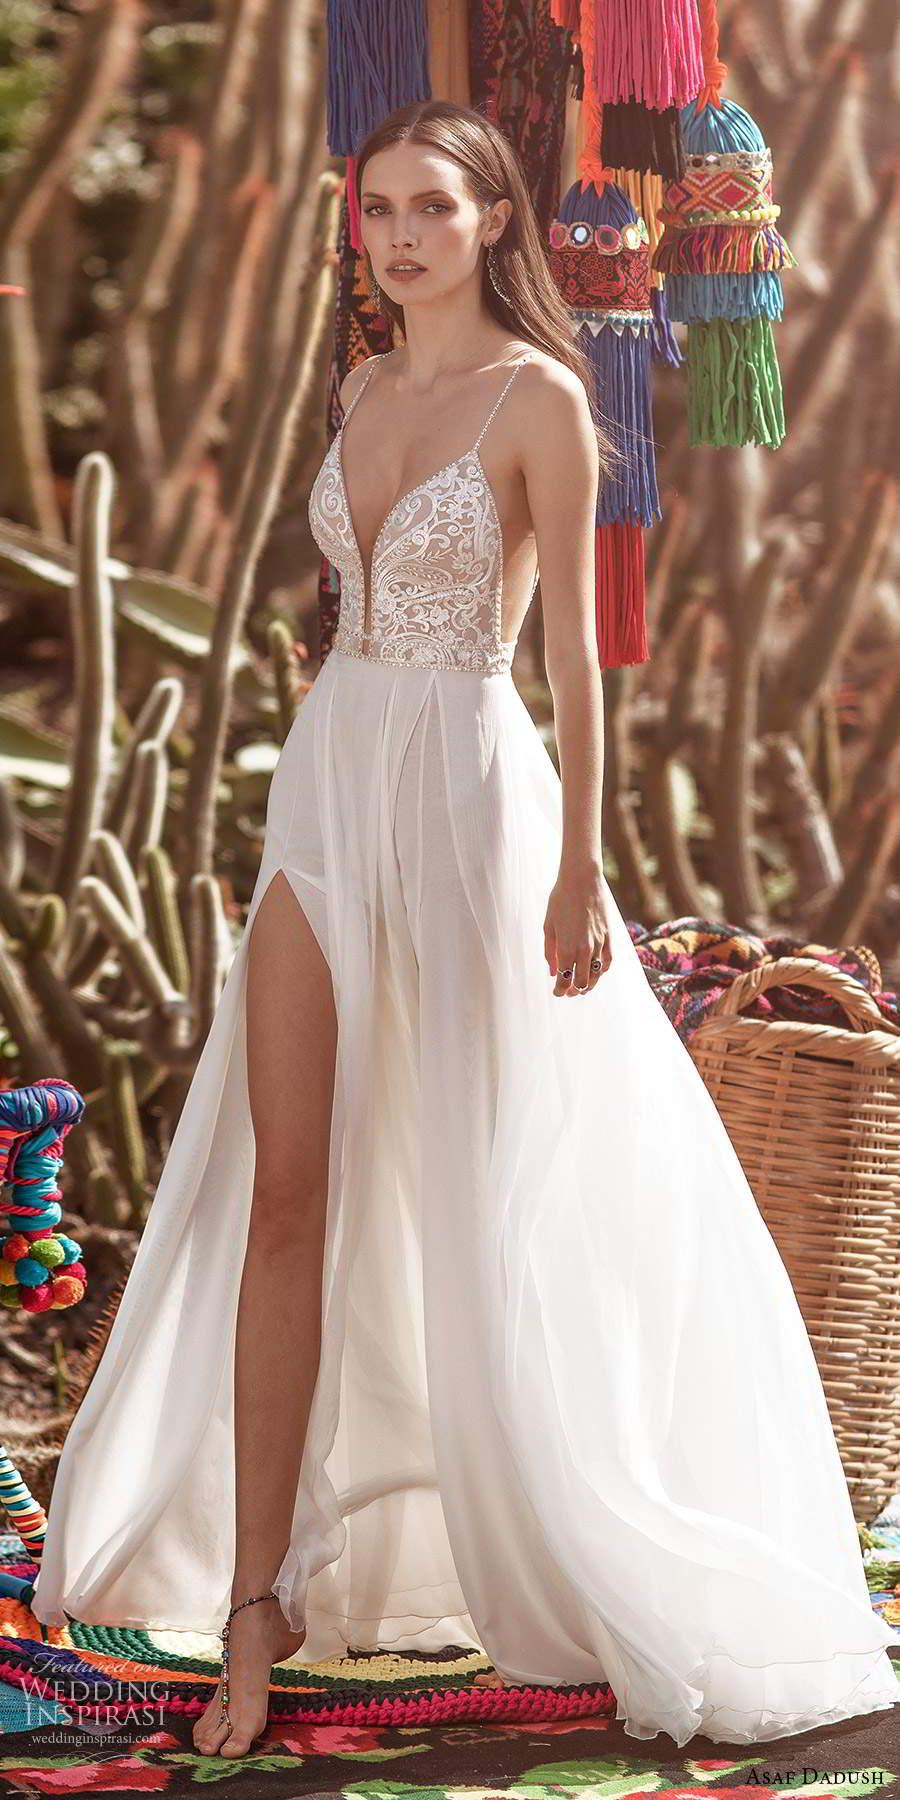 asaf dadush 2020 bridal sleeveless thin straps plunging v neckline heavily embellished bodice clean skirt a line wedding dress chapel train (1) sv